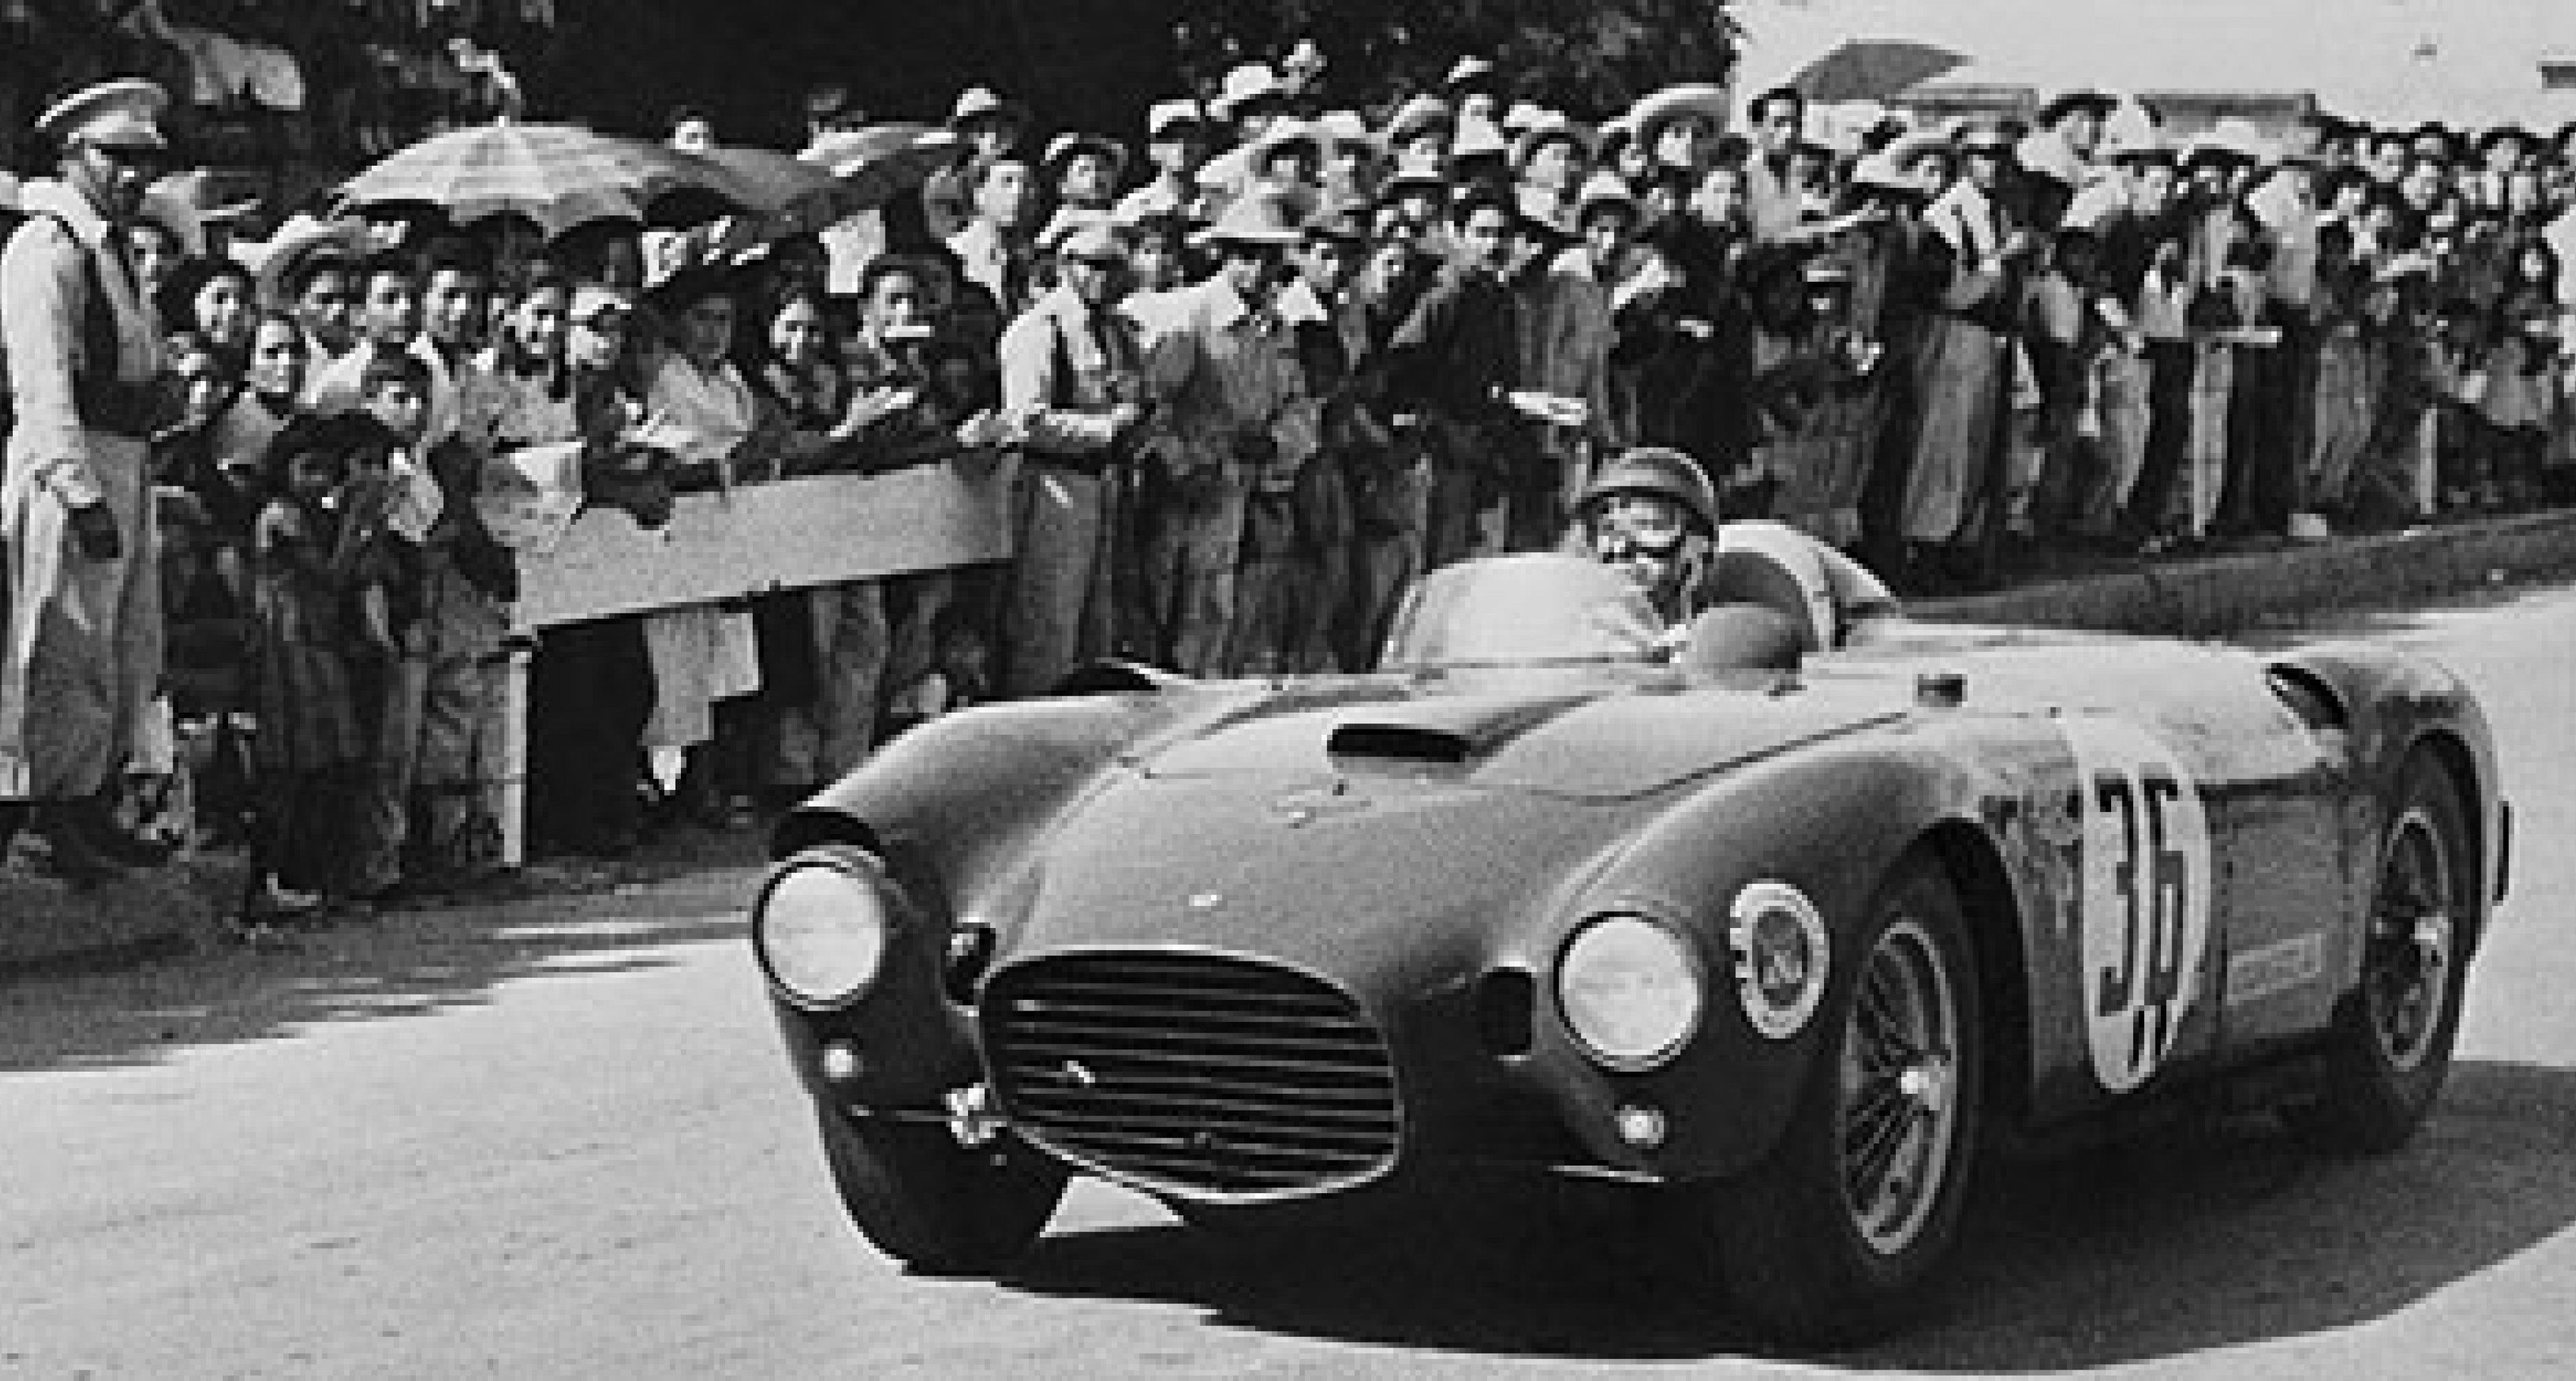 Carrera Panamericana: Lancia-Sieg von 1953